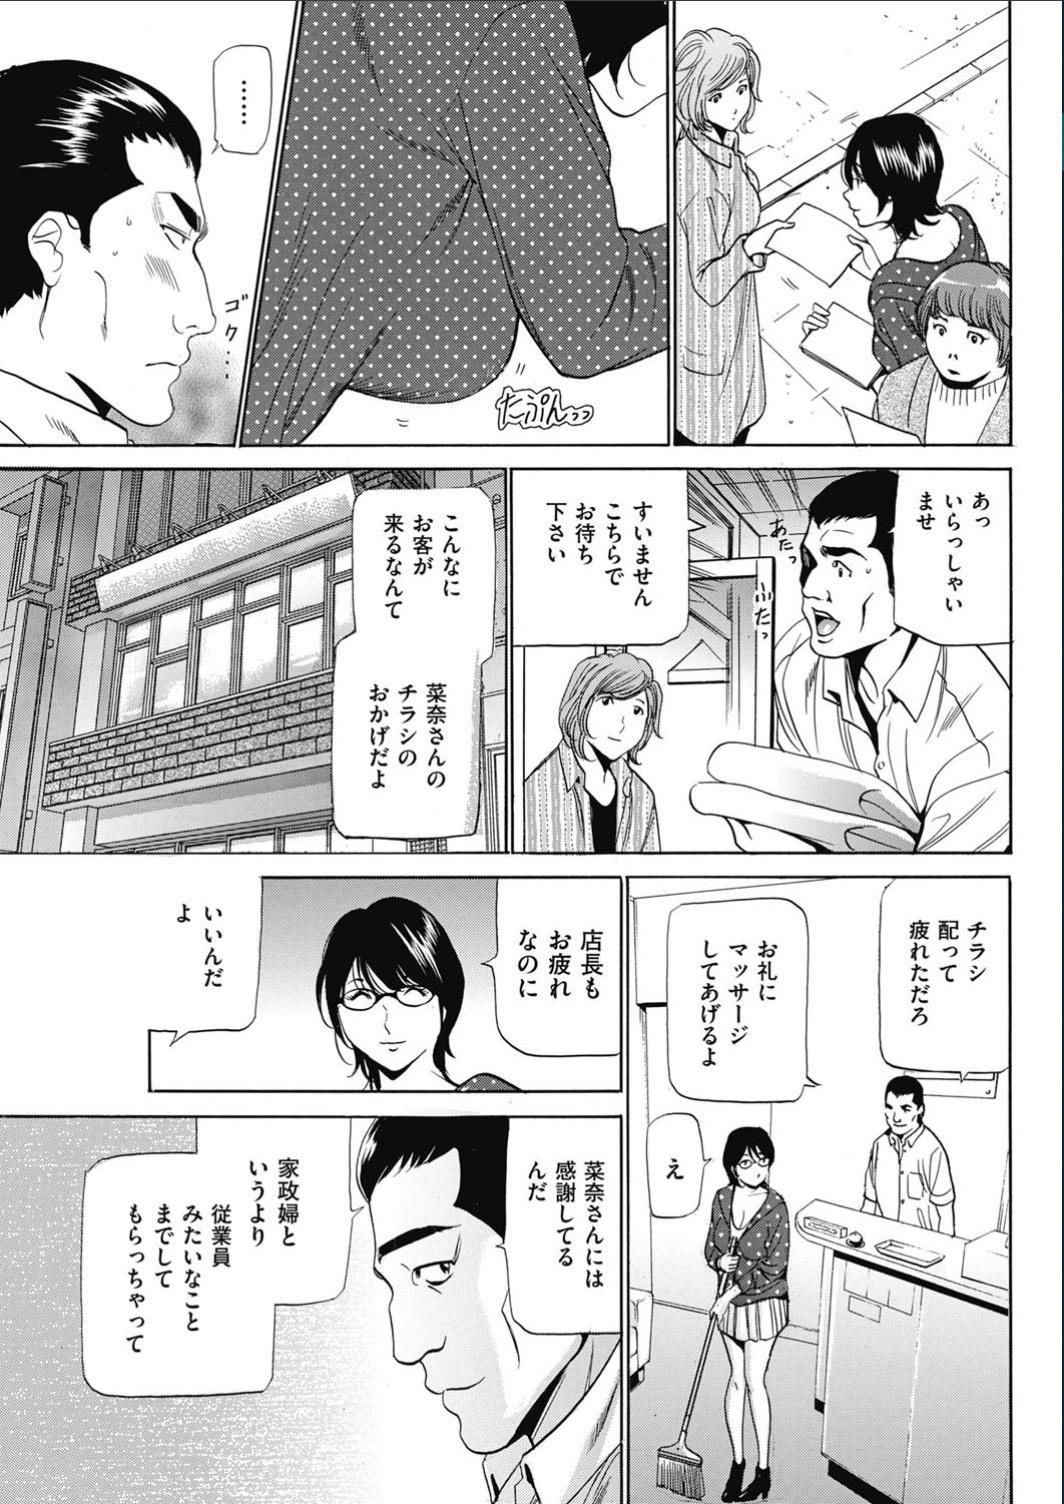 Wa Usuki Ipa a 1-10 99